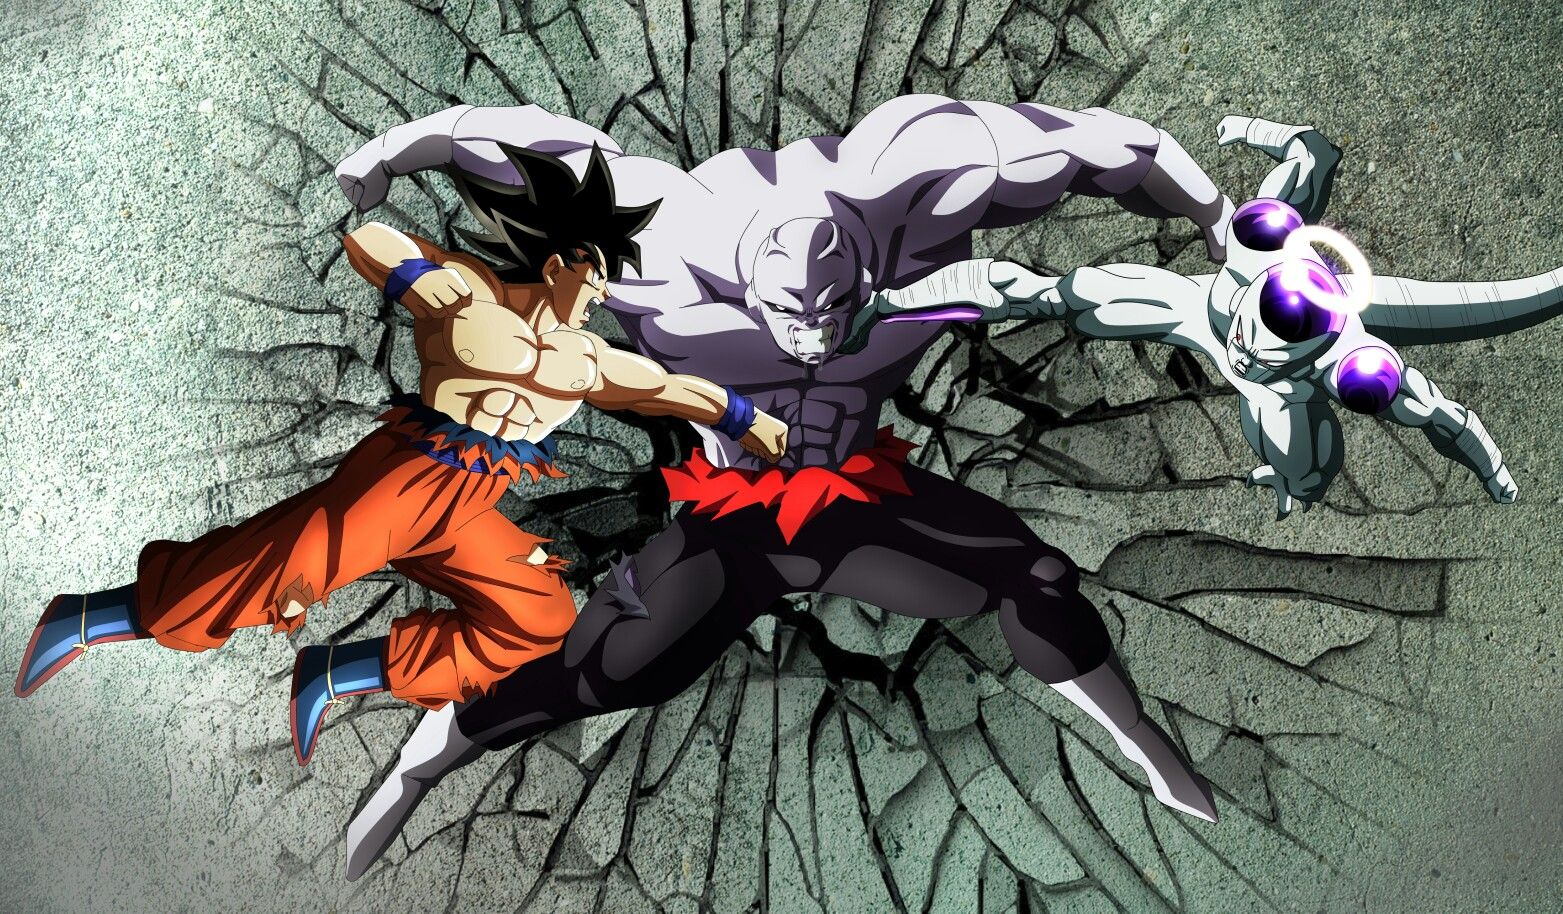 Jiren Vs Goku And Frieza Anime Dragon Ball Super Anime Dragon Ball Dragon Ball Super